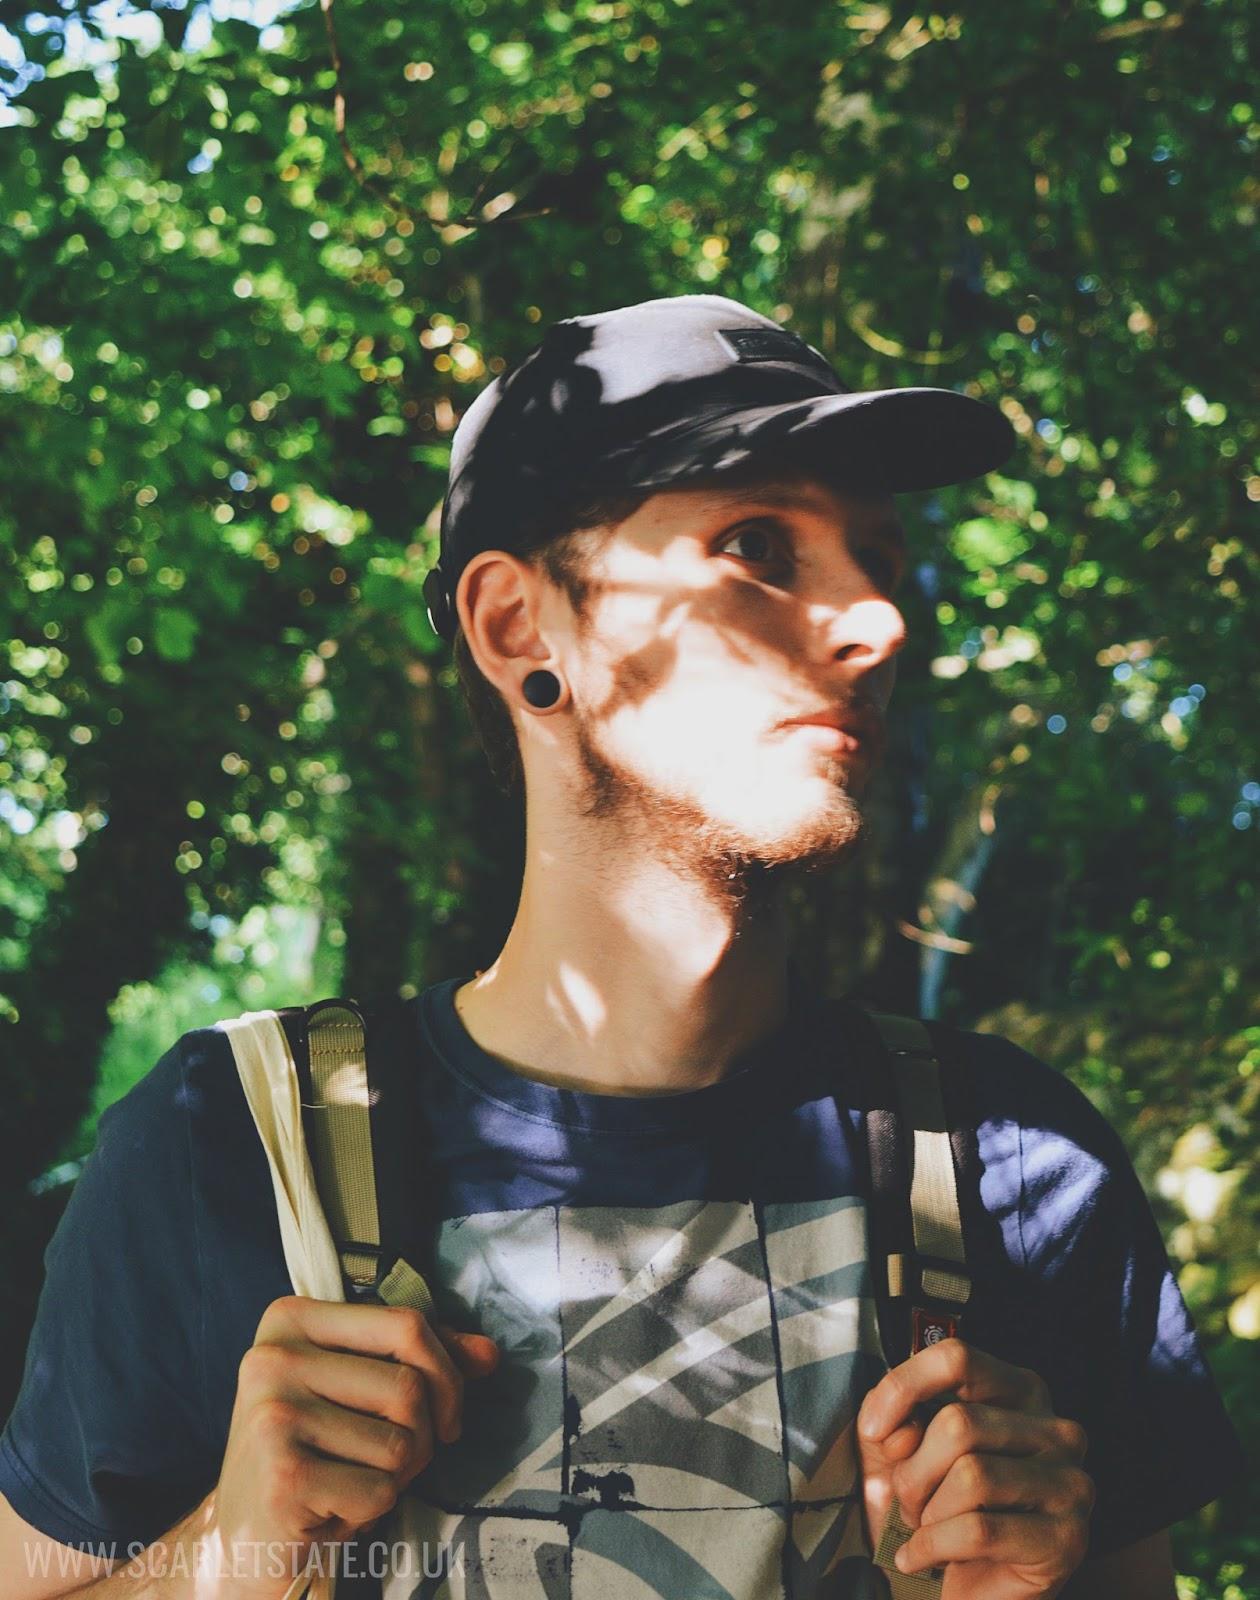 Man in hat in sunshine